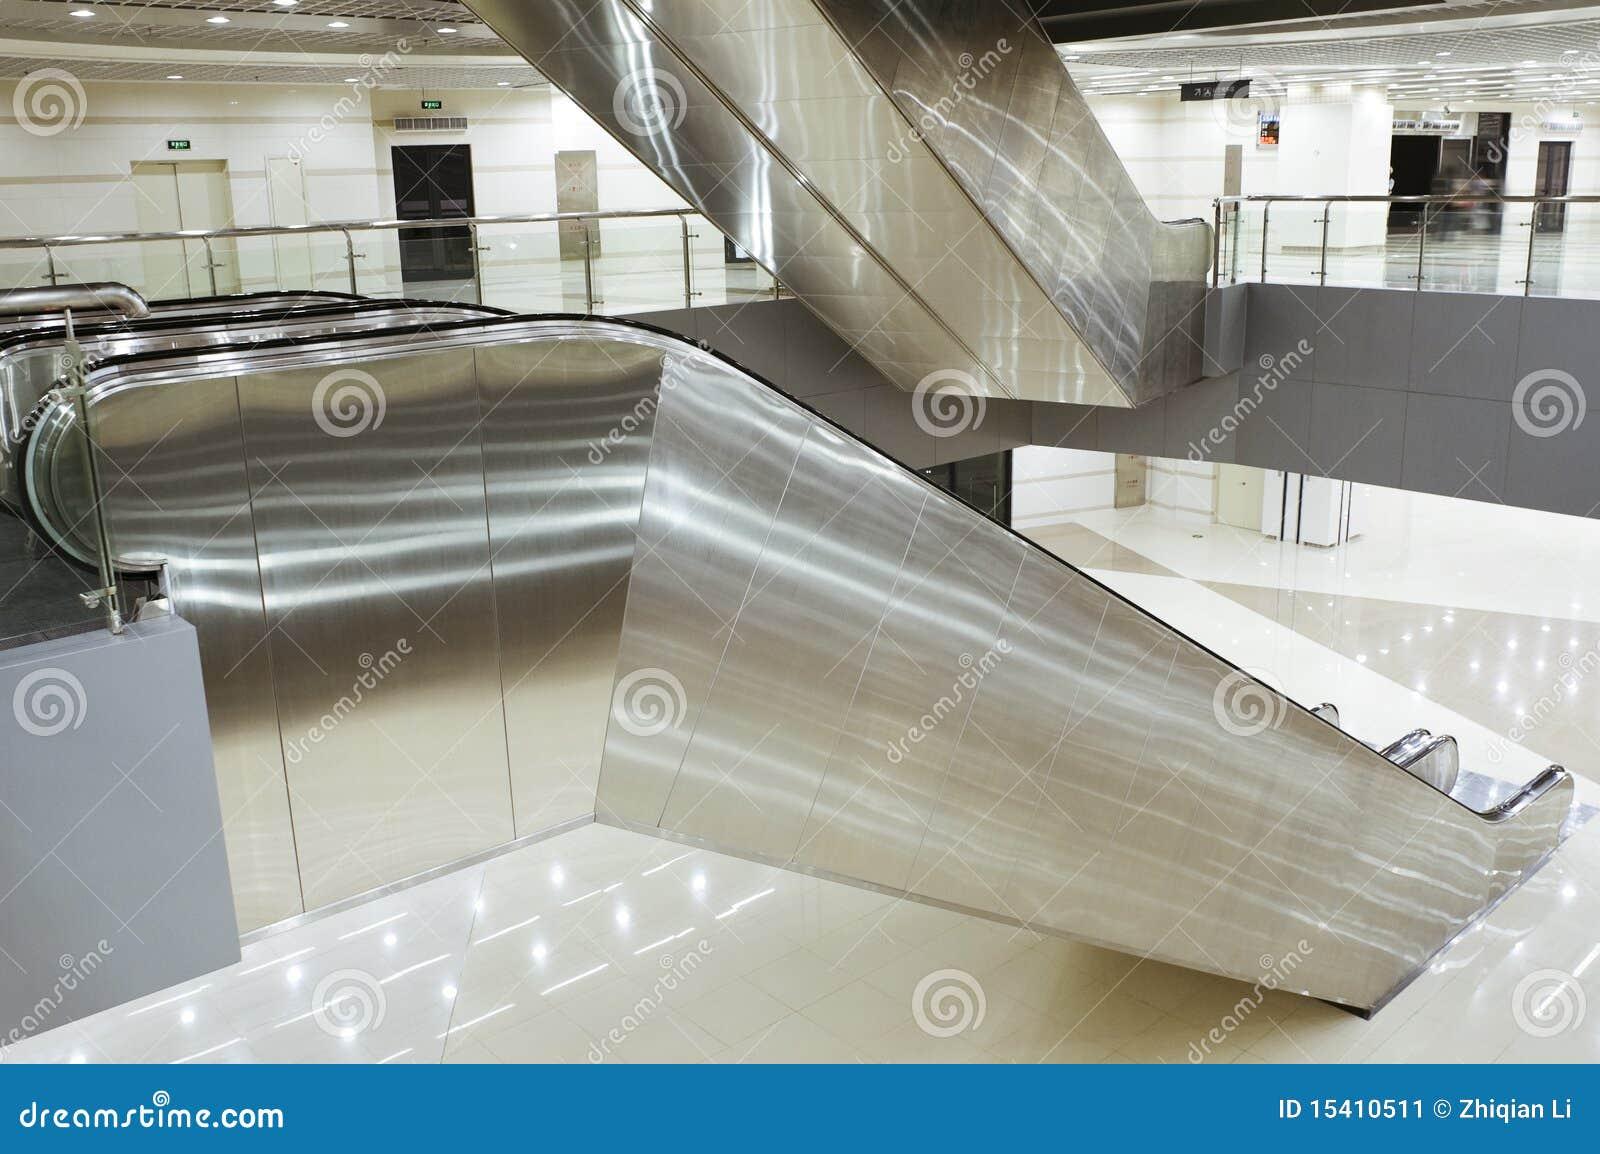 Stainless Steel Escalators : Escalator stock image